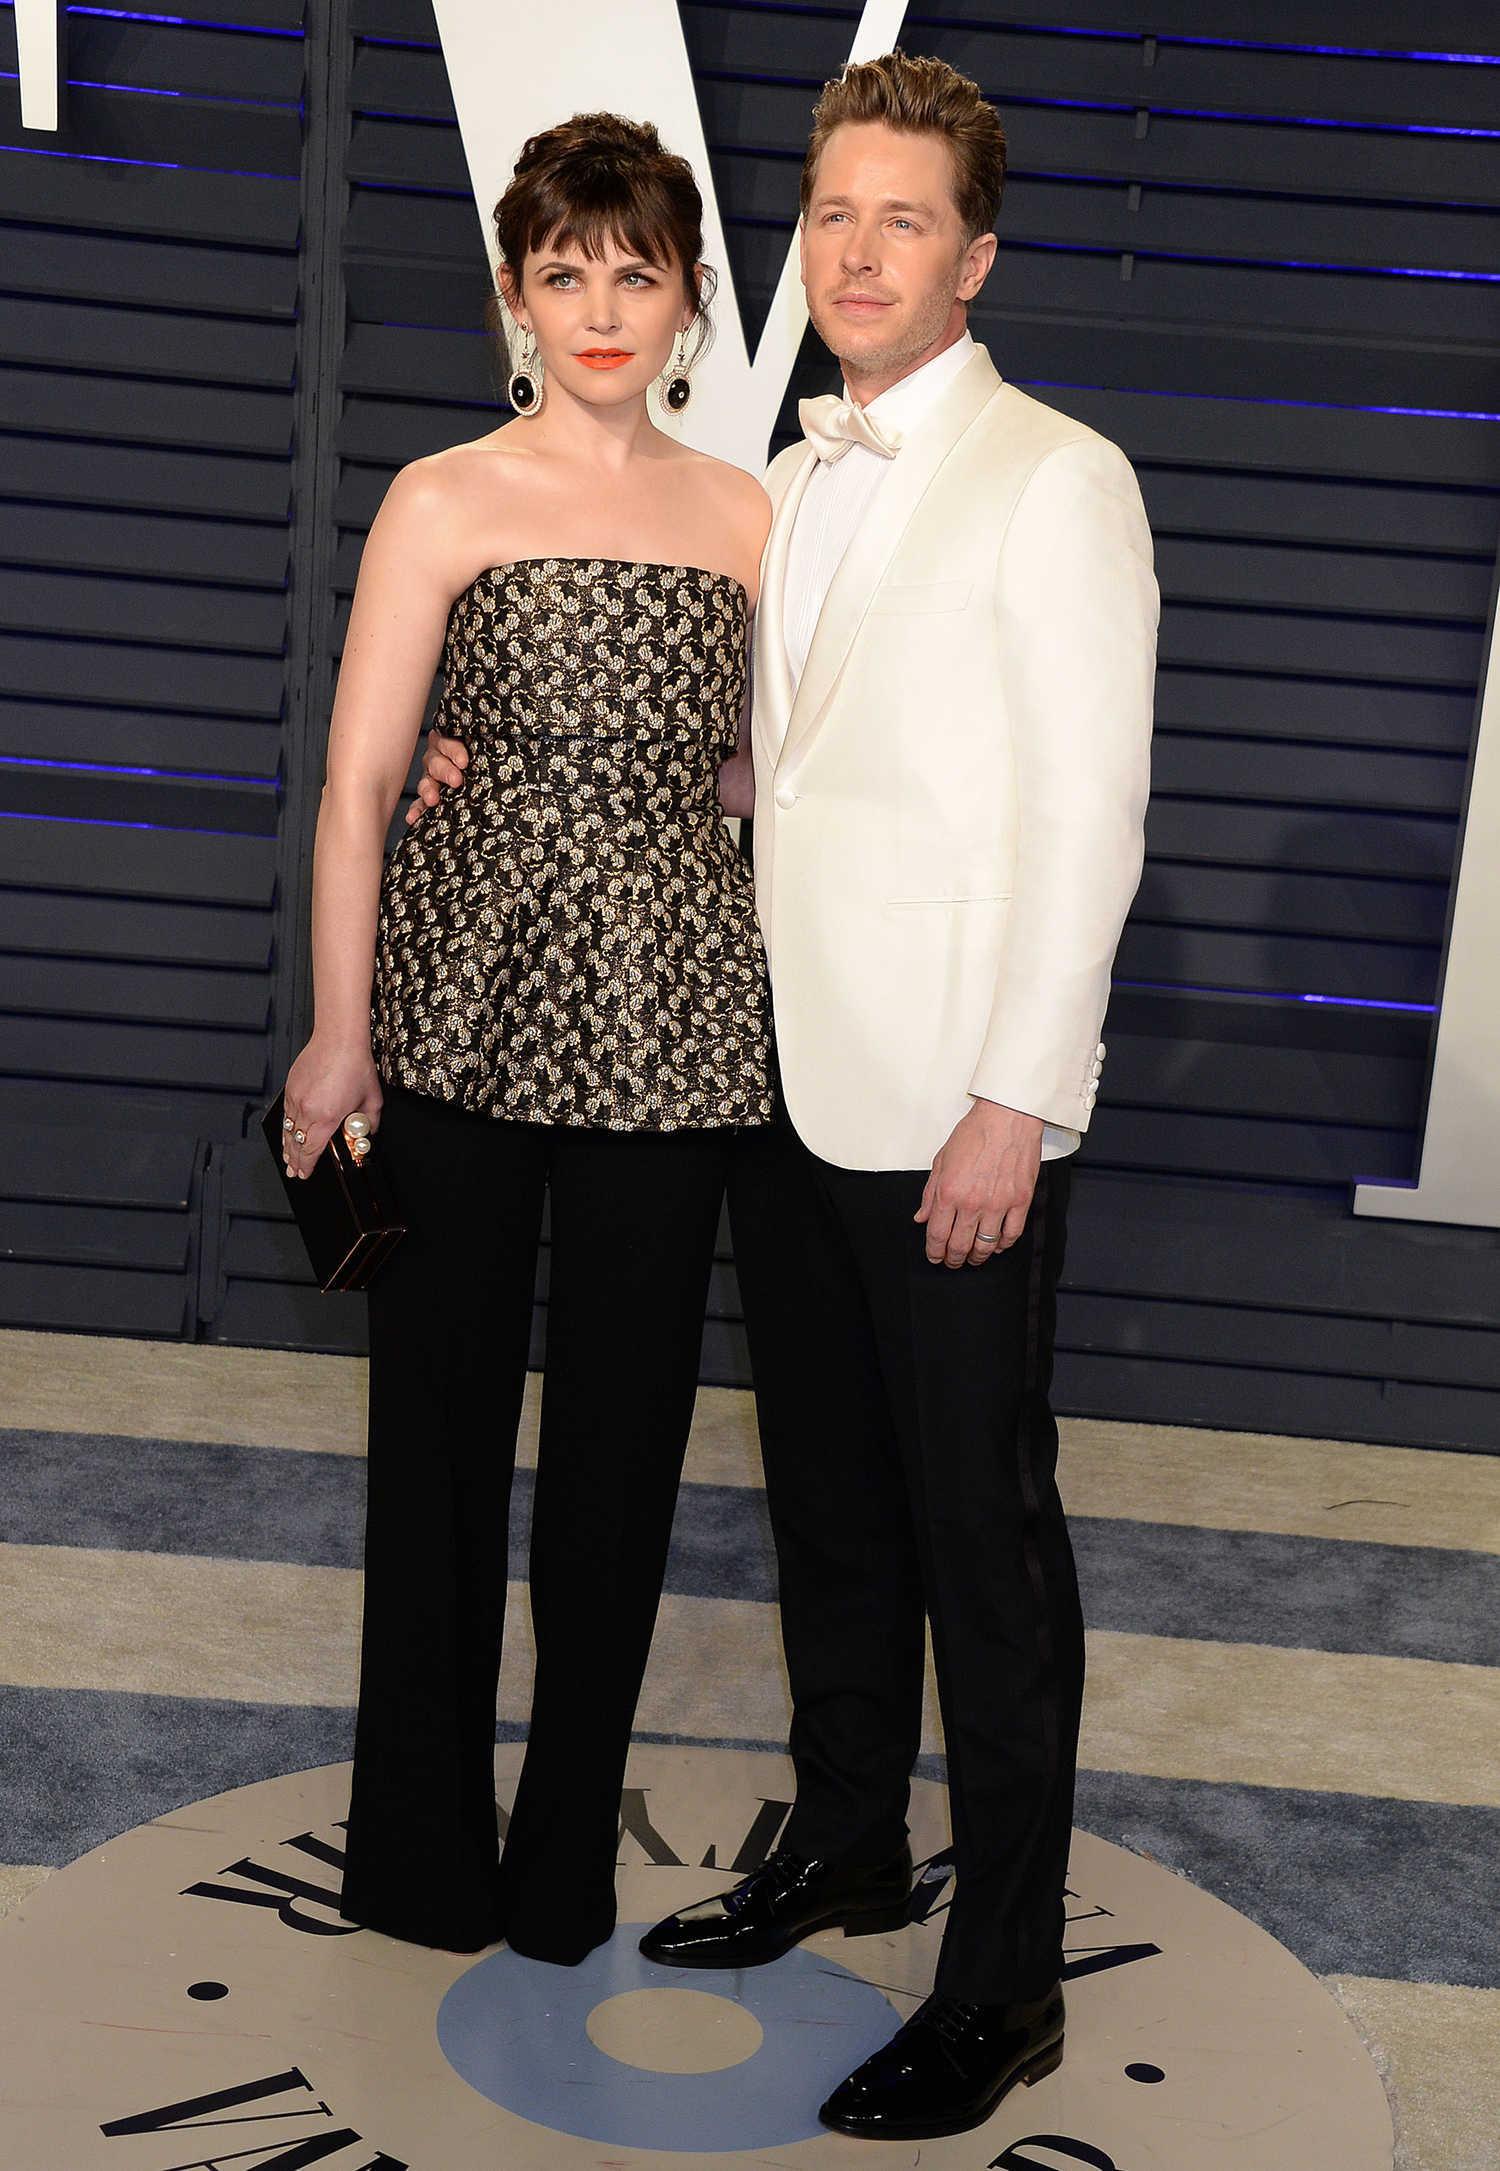 Ginnifer Goodwin Attends 2019 Vanity Fair Oscar Party in ...